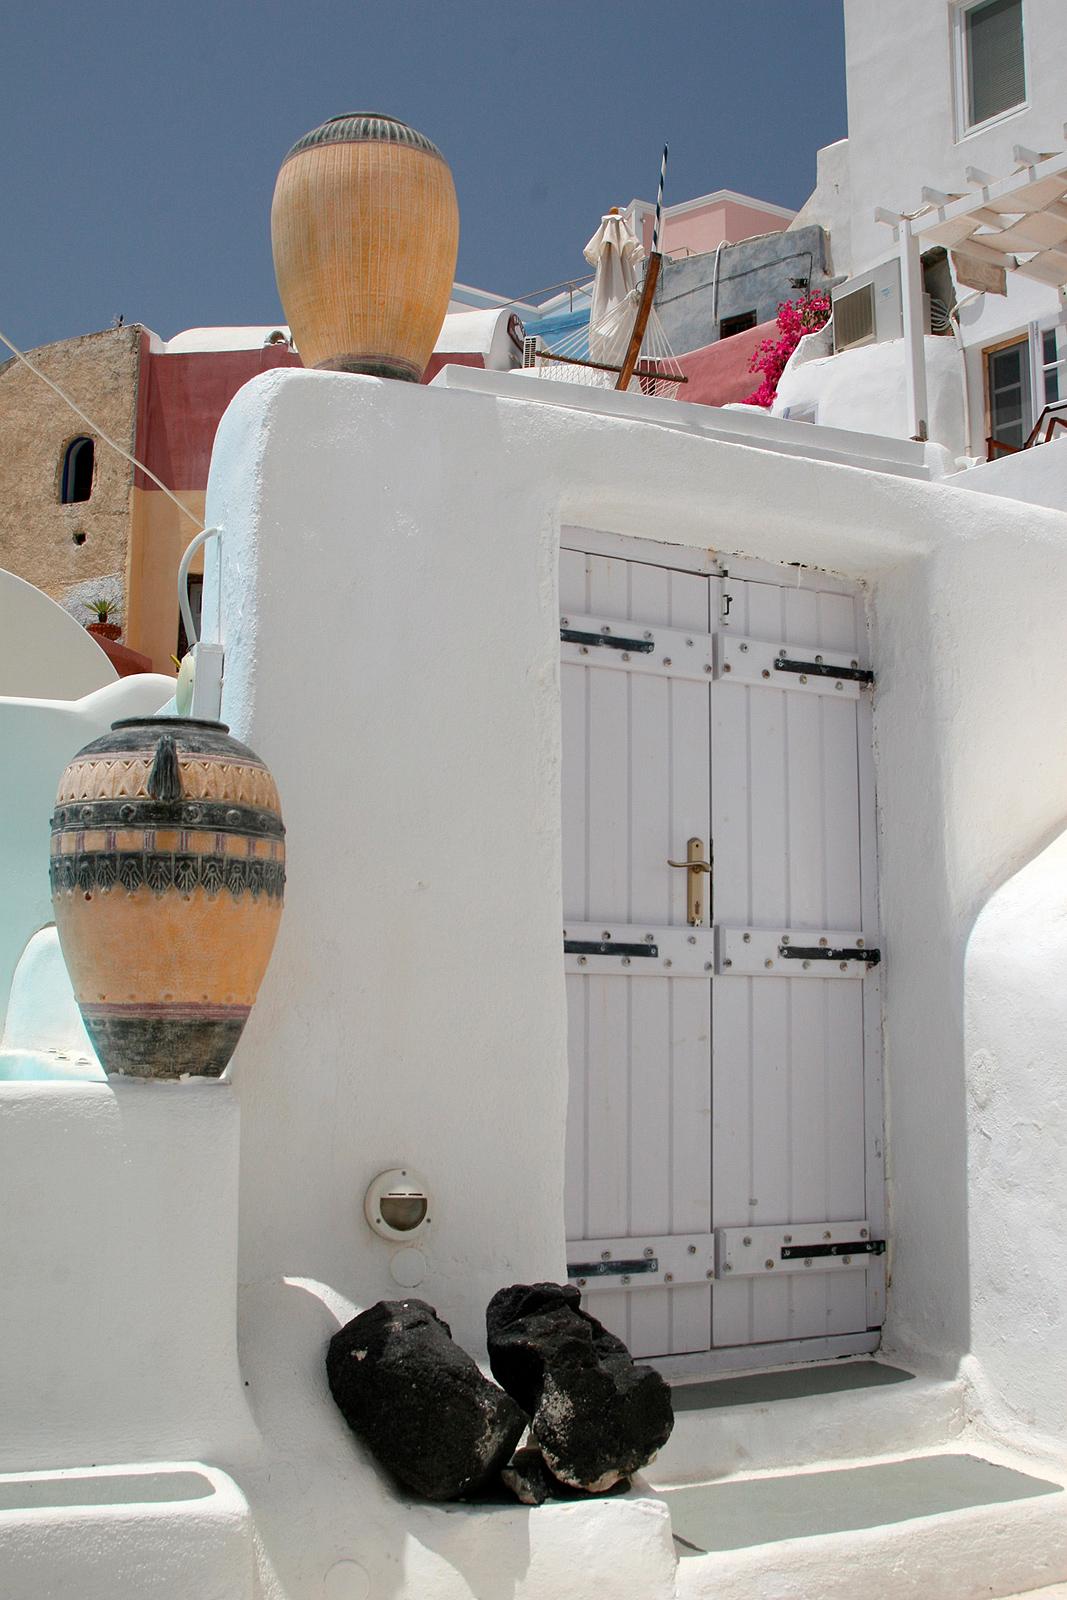 nsp_070626_02_Santorini.jpg